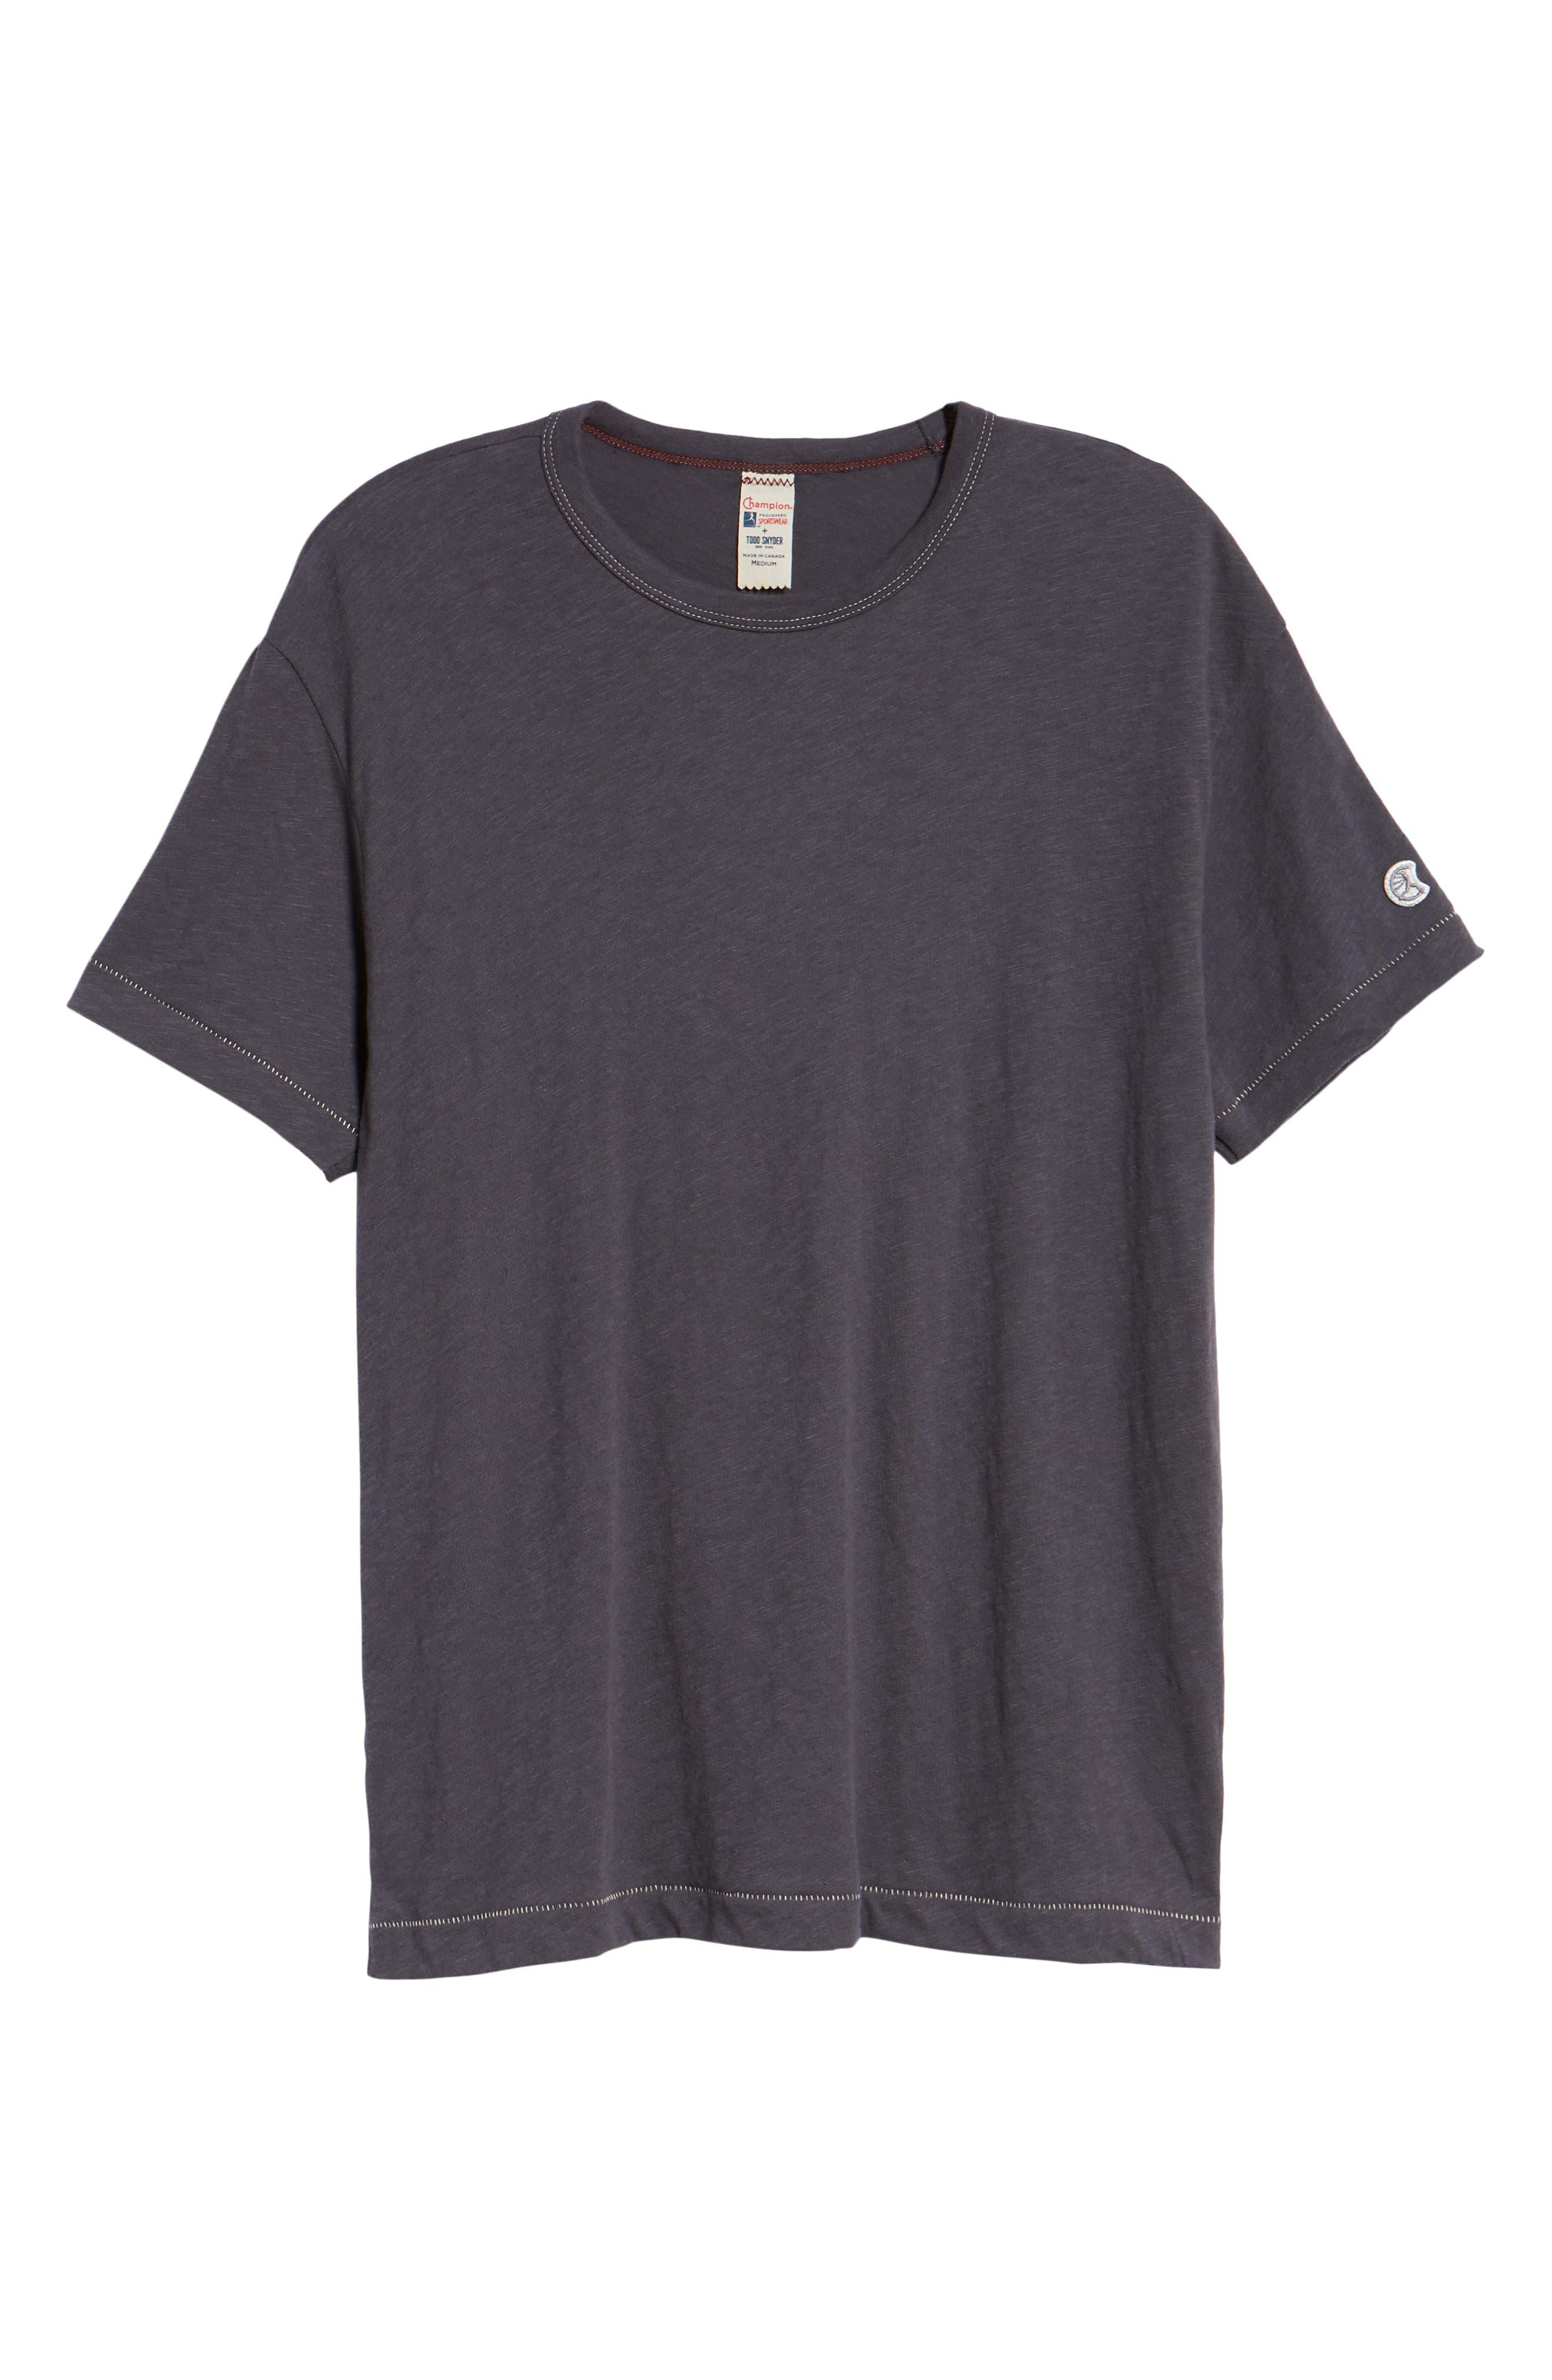 TODD SNYDER,                             + Champion Crewneck T-Shirt,                             Alternate thumbnail 6, color,                             060